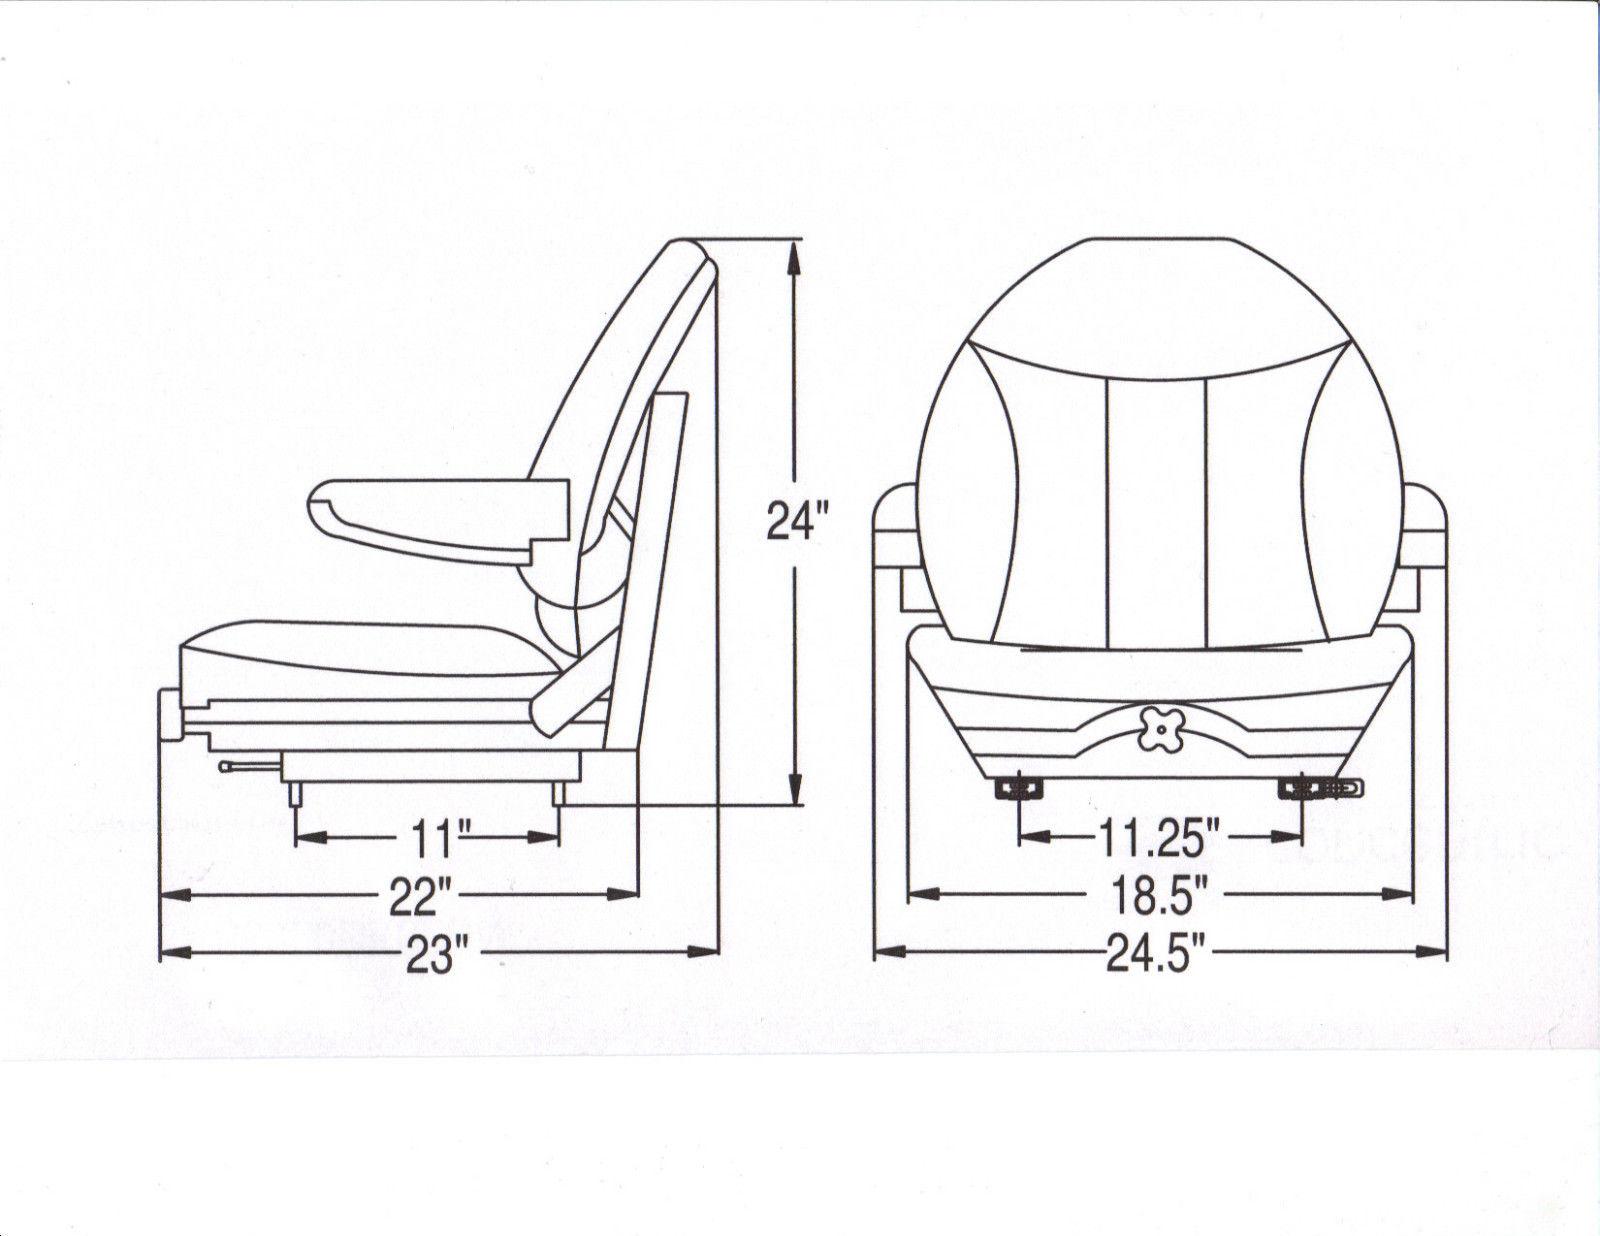 Suspension seat w arm rests ztr zero turn mower grasshopper suspension seat w arm rests ztr zero turn pooptronica